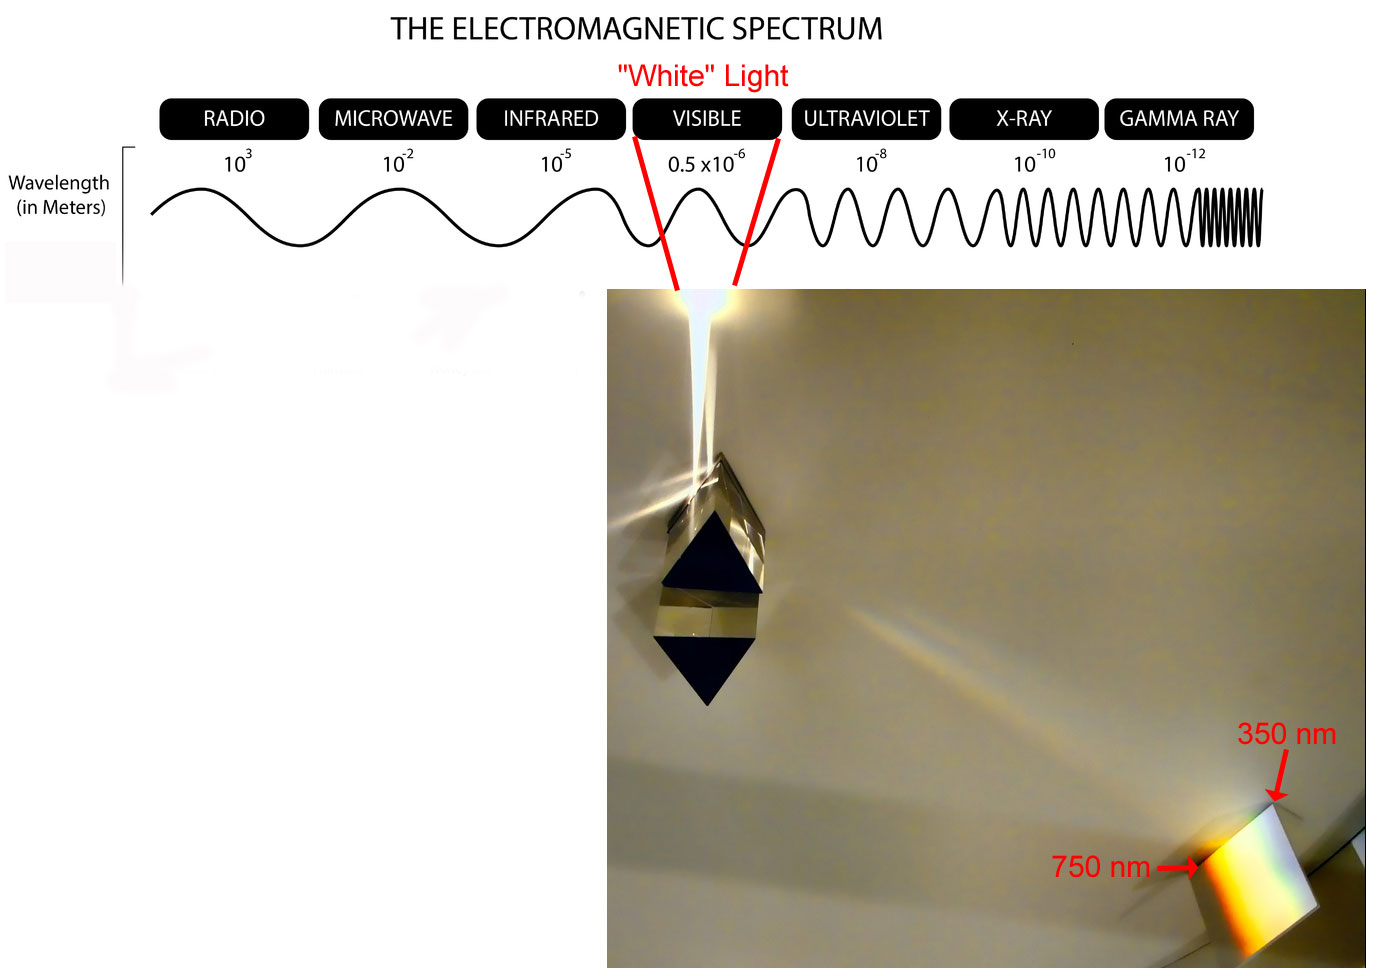 electromagnetic spectrum diagram labeled 12v led lights wiring waves and radiation